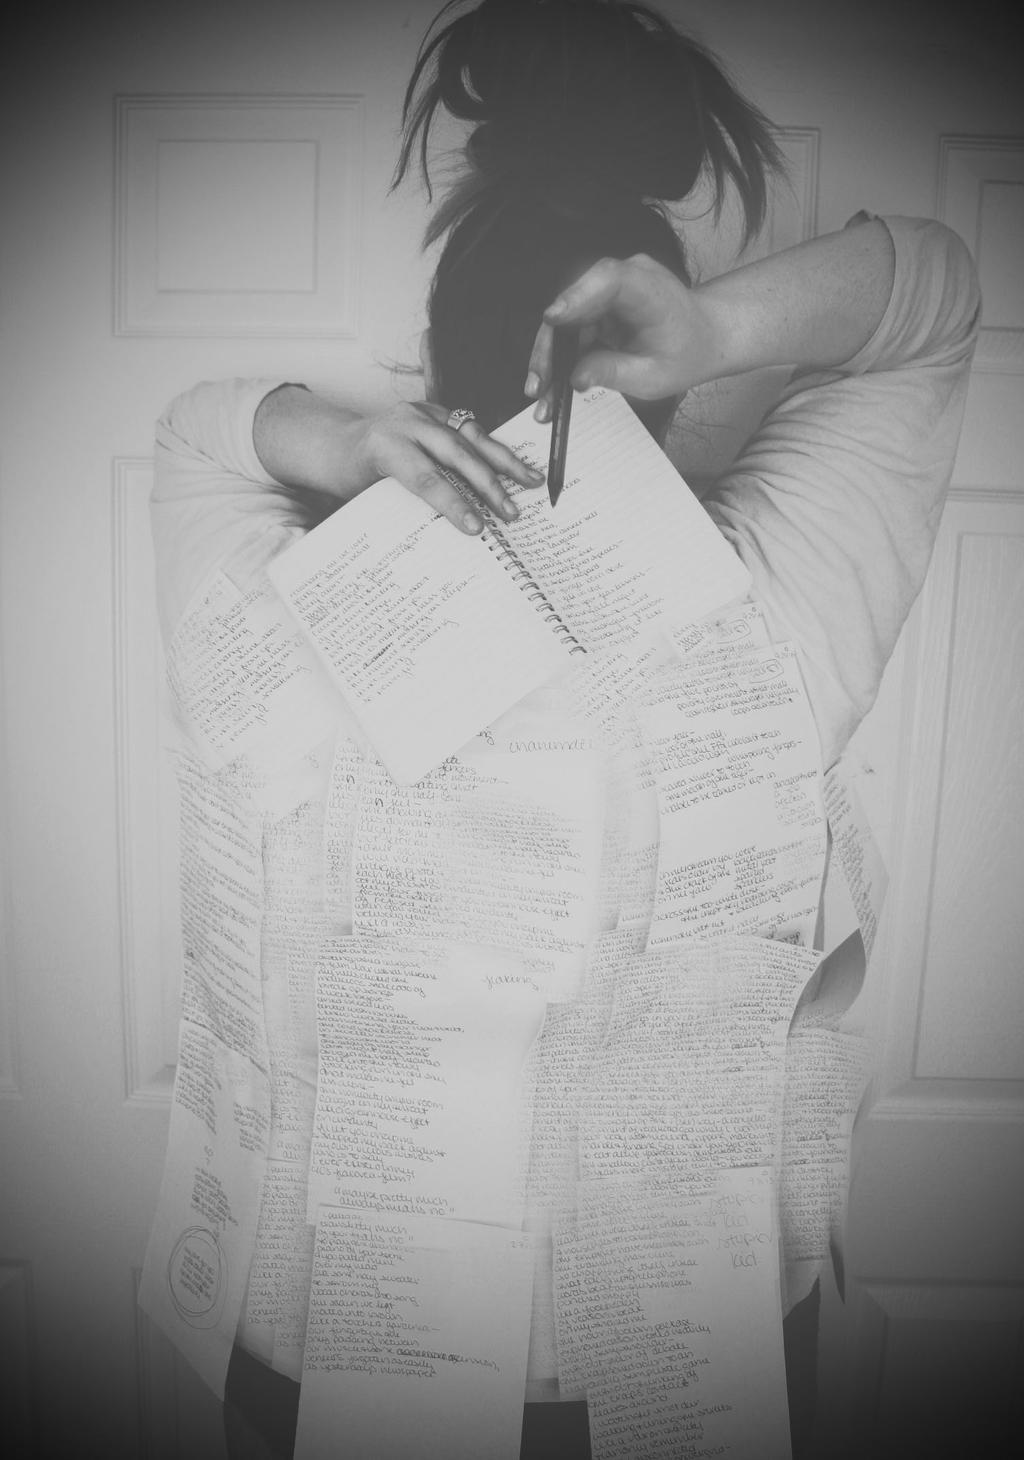 Complications by schriftsteller